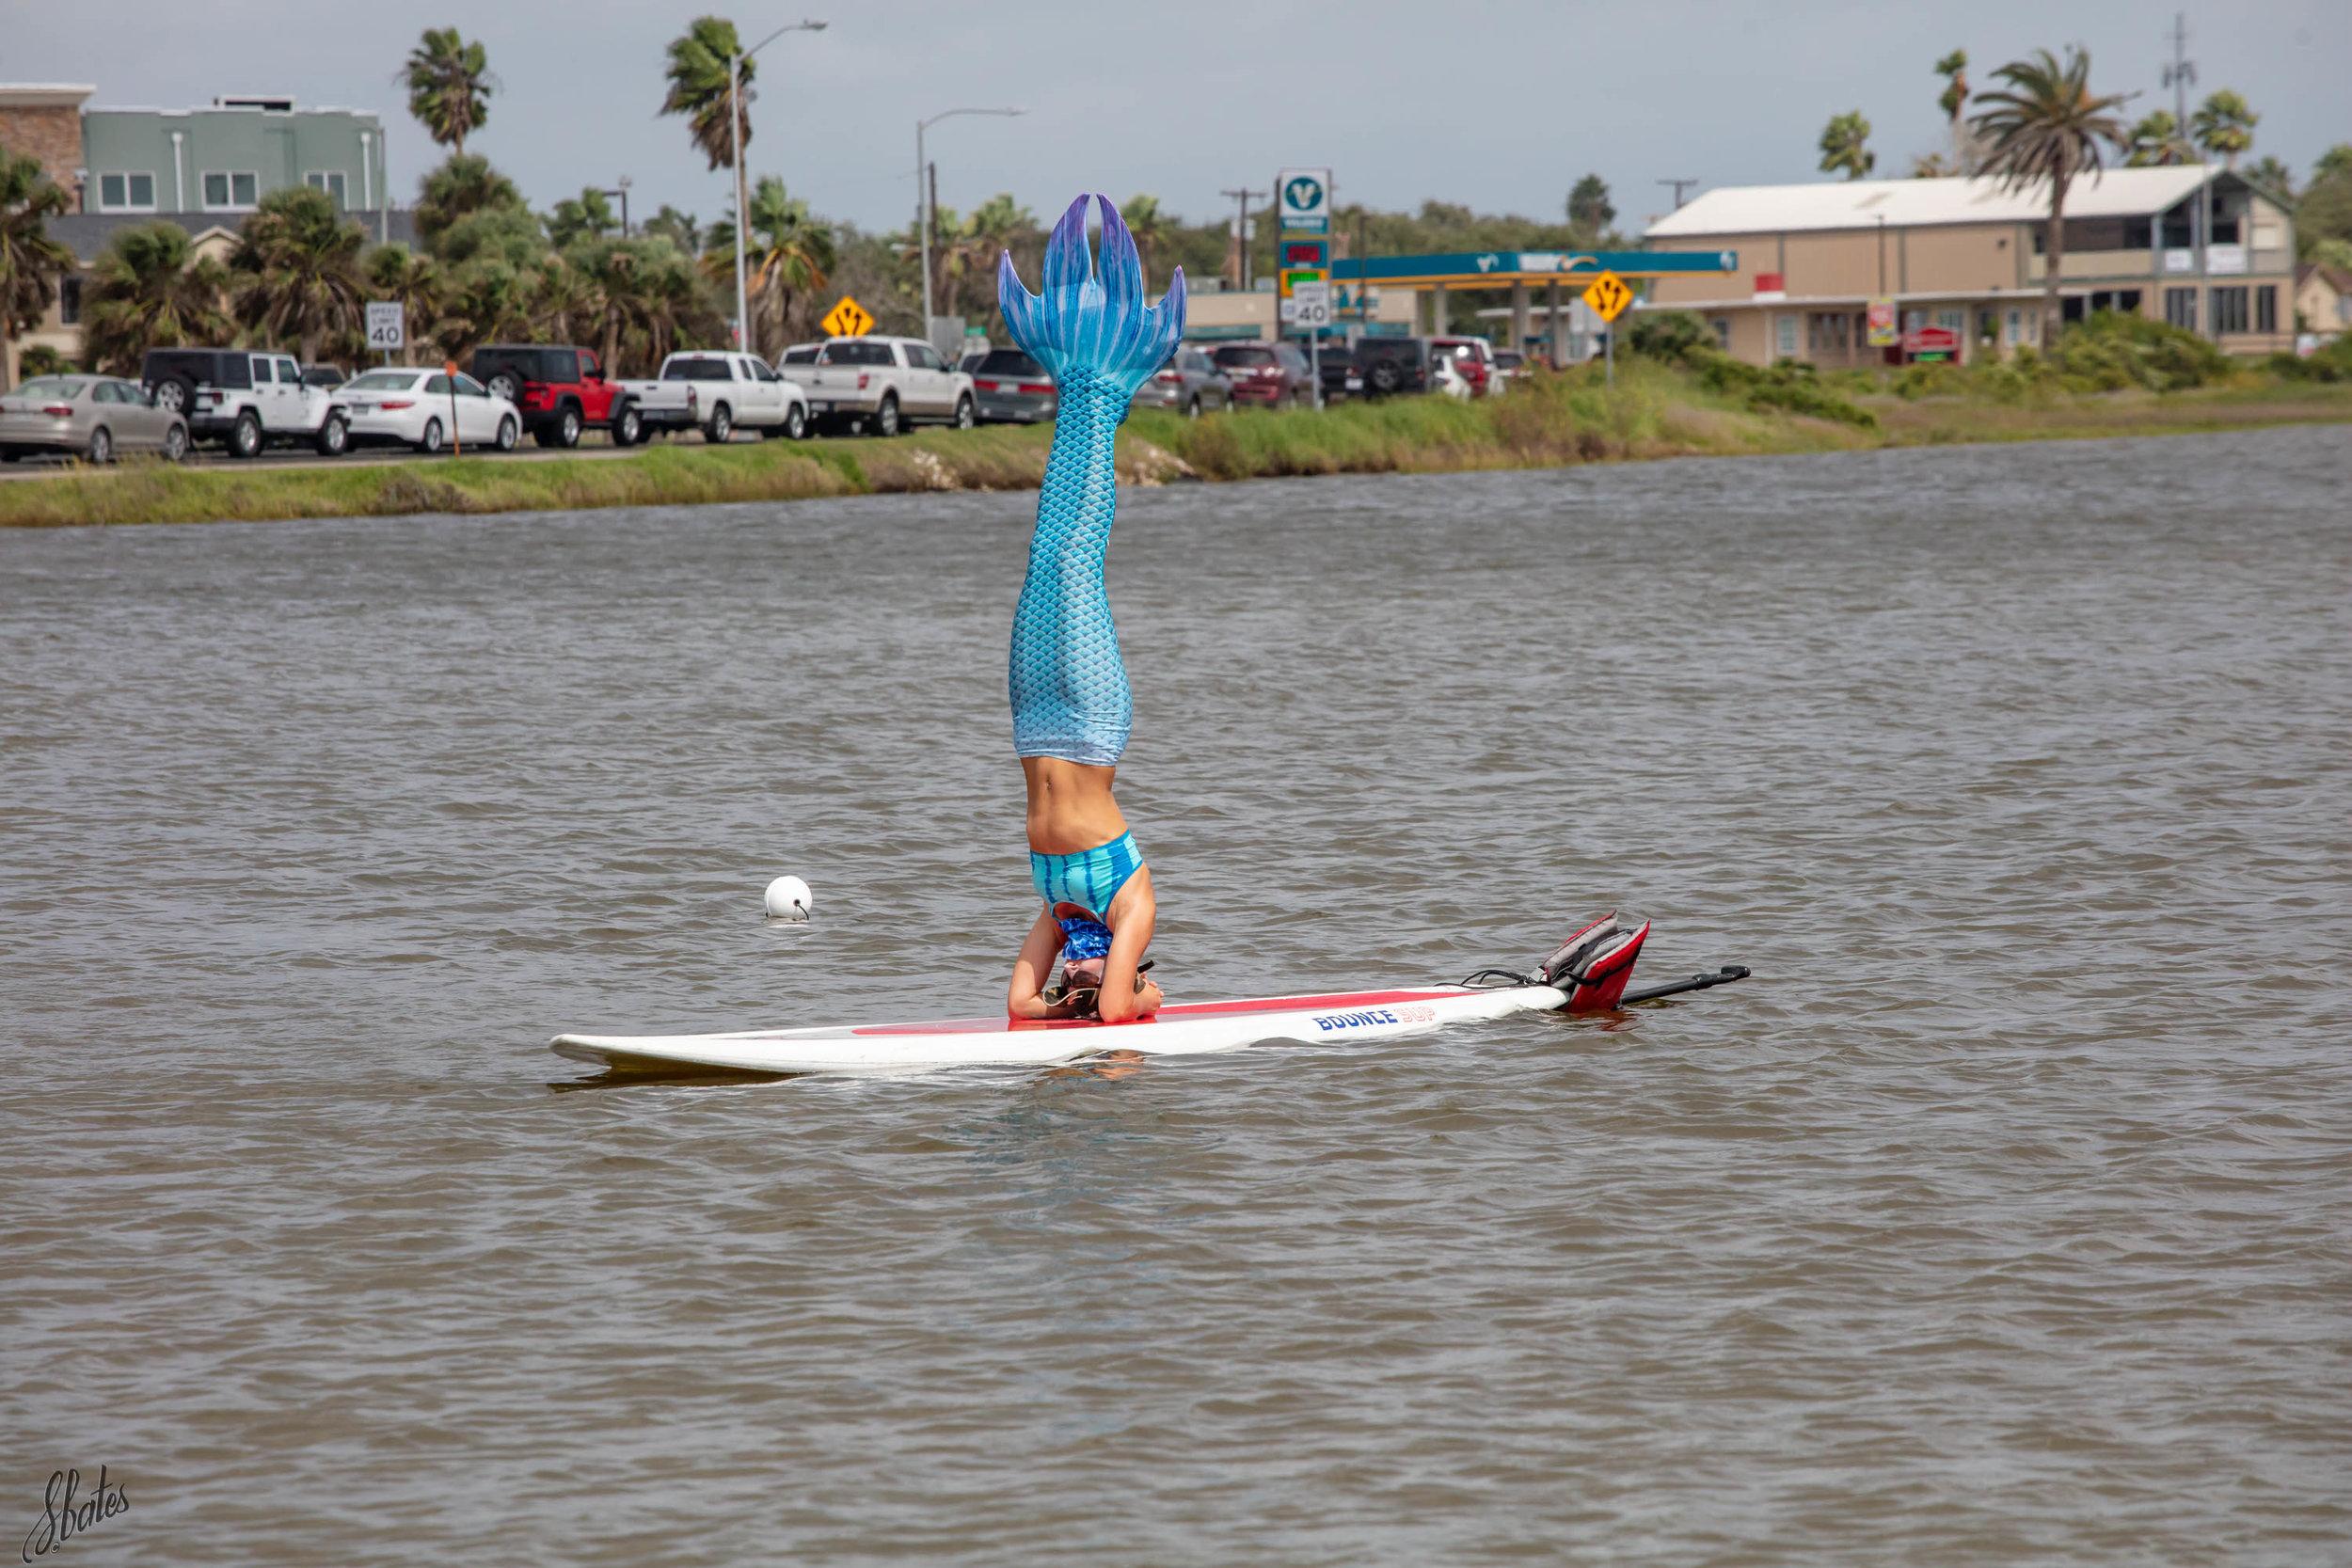 This mermaid teaches kayaking.